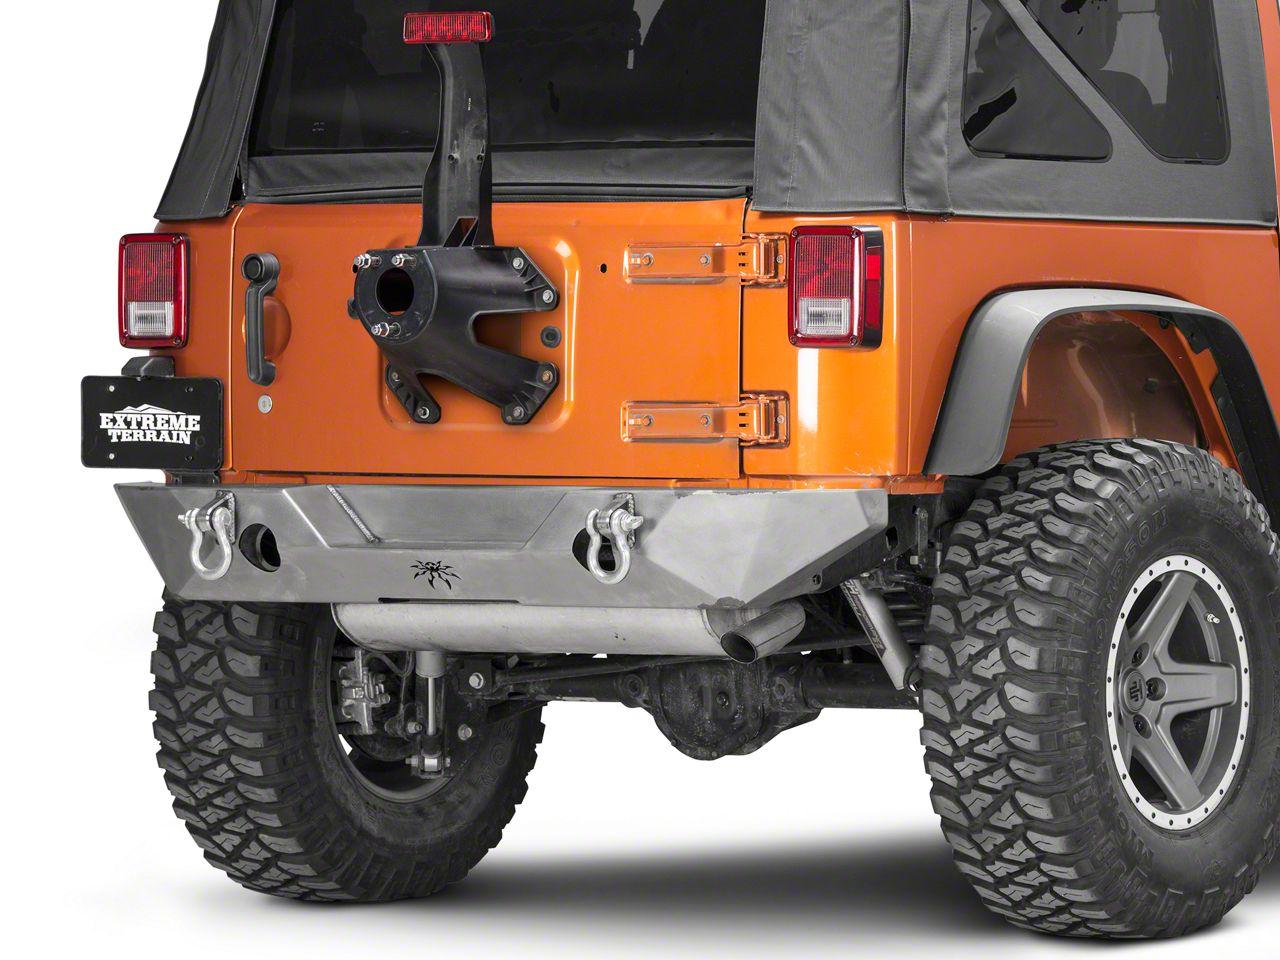 Poison Spyder RockBrawler Rear Bumper - Bare Steel (07-18 Jeep Wrangler JK)